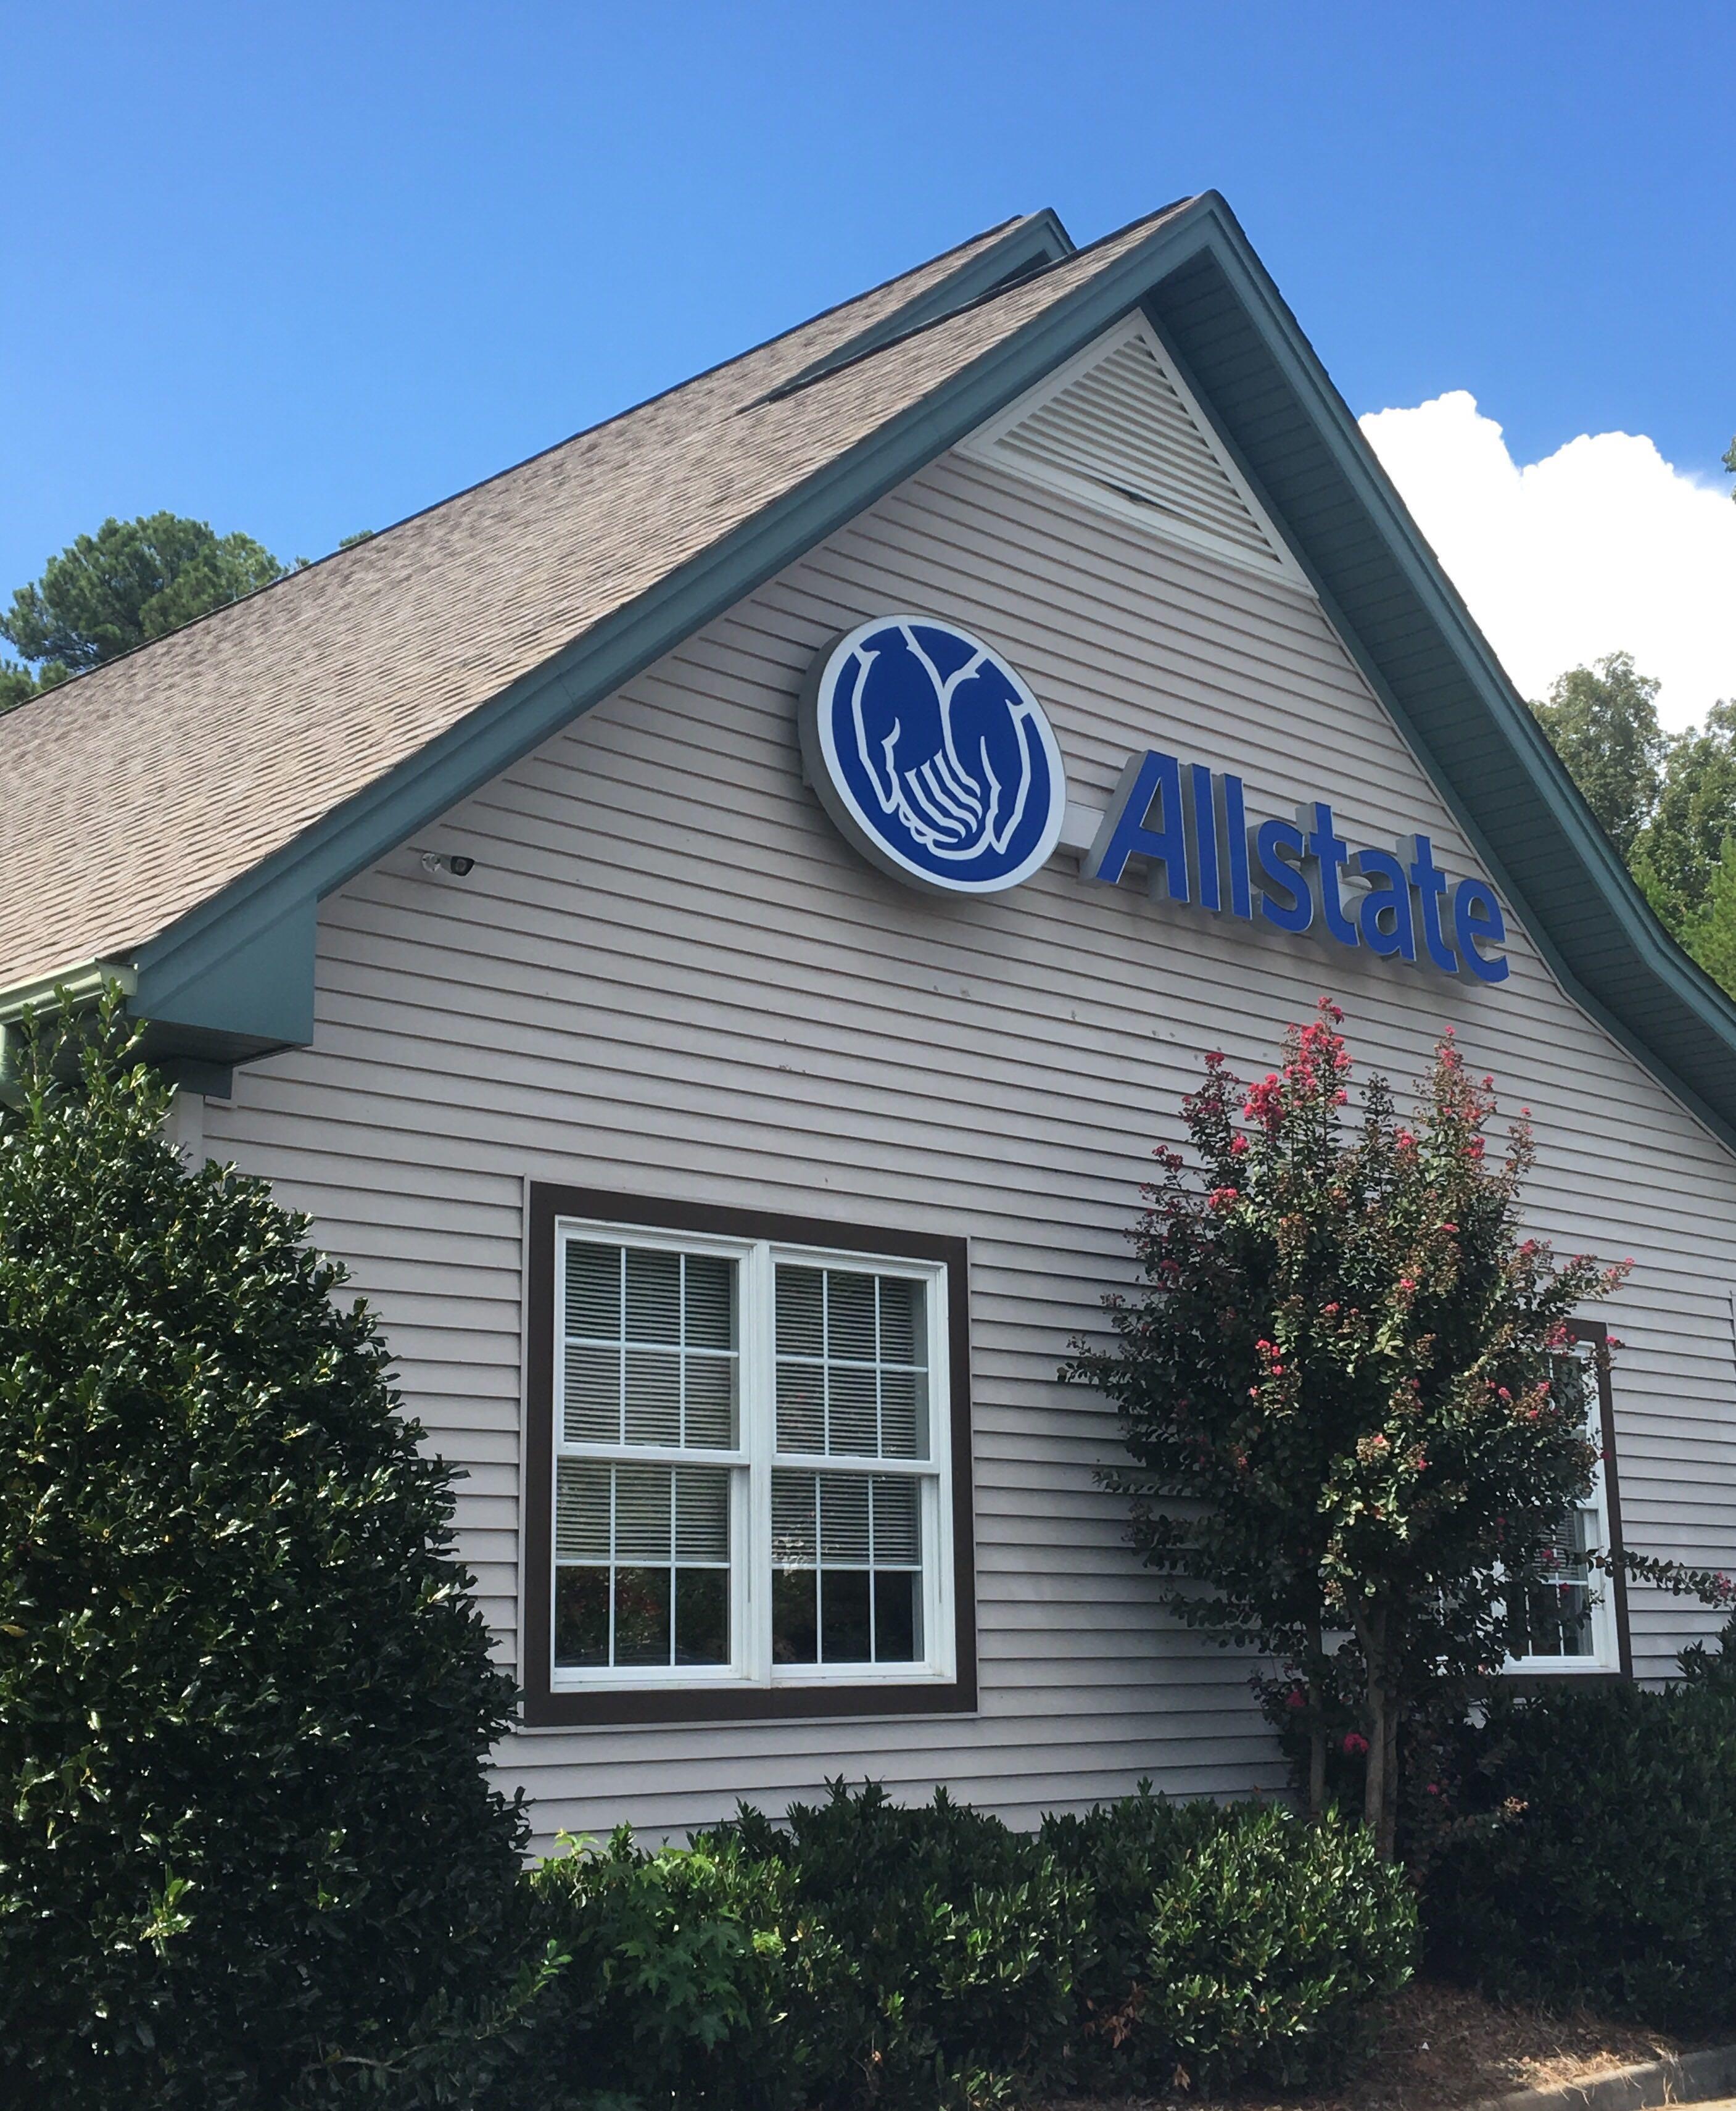 Allstate Car Insurance: Car Insurance In Seneca, SC - Julian Davis